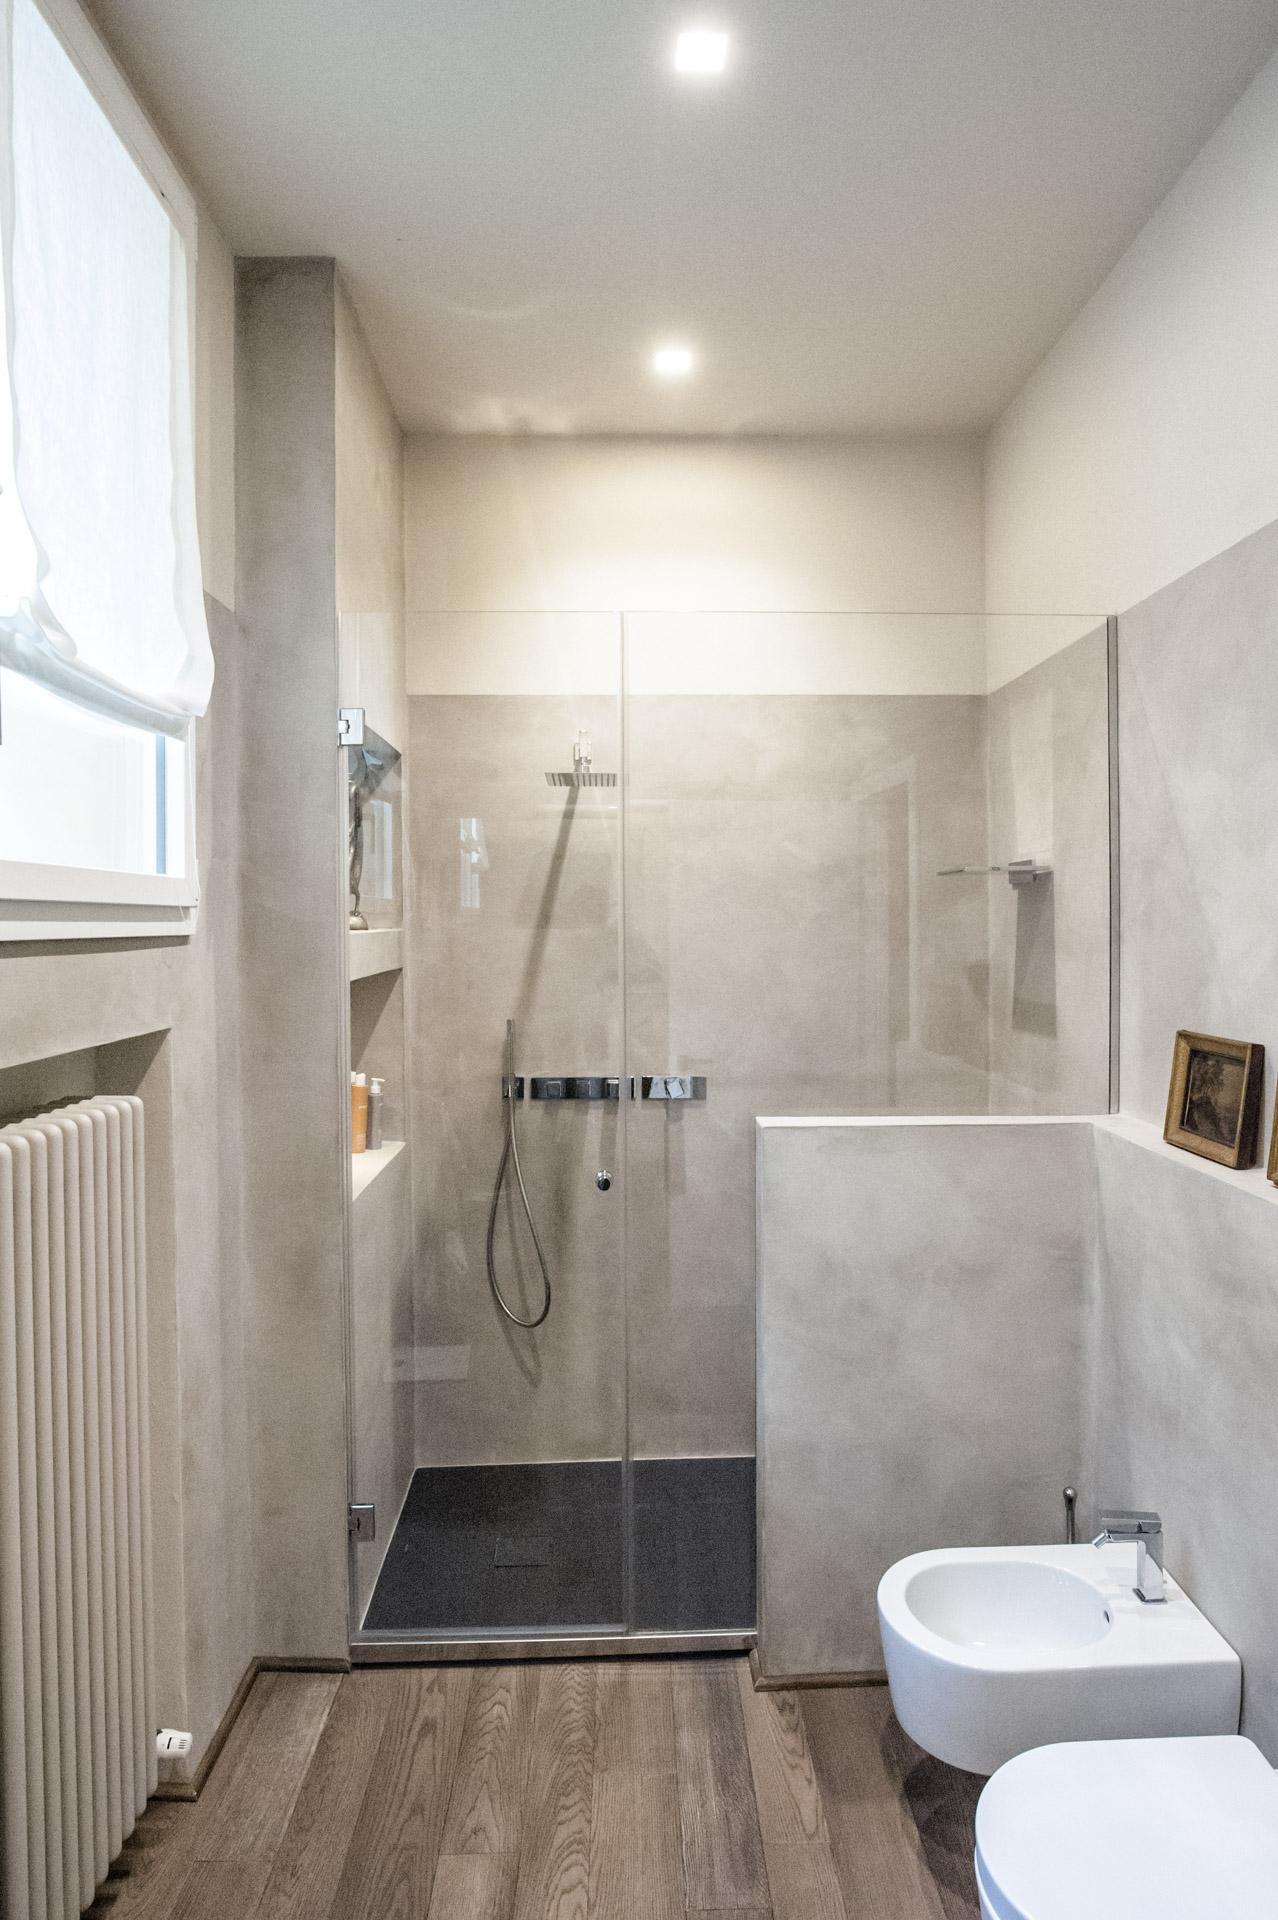 chiara-castellli-casa-bagno 1 doccia.jpg